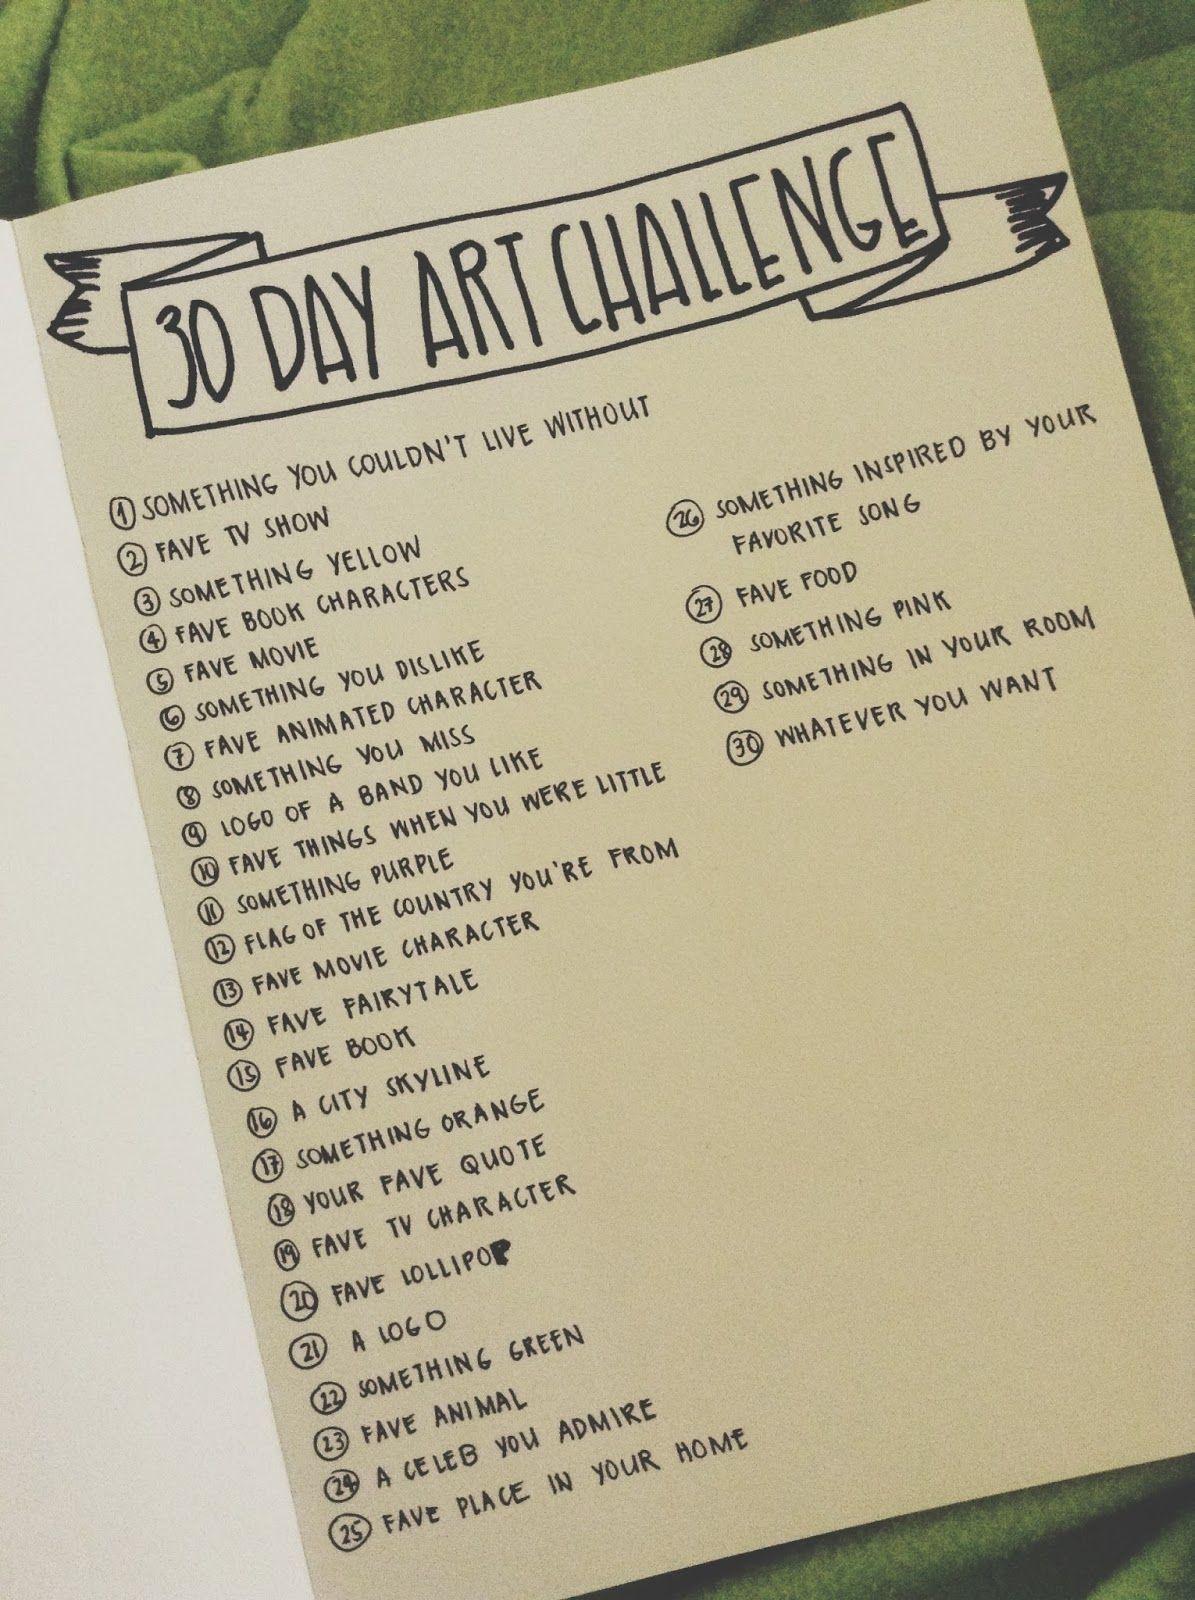 Ideas to jump start motivation.. 30 day art challenge